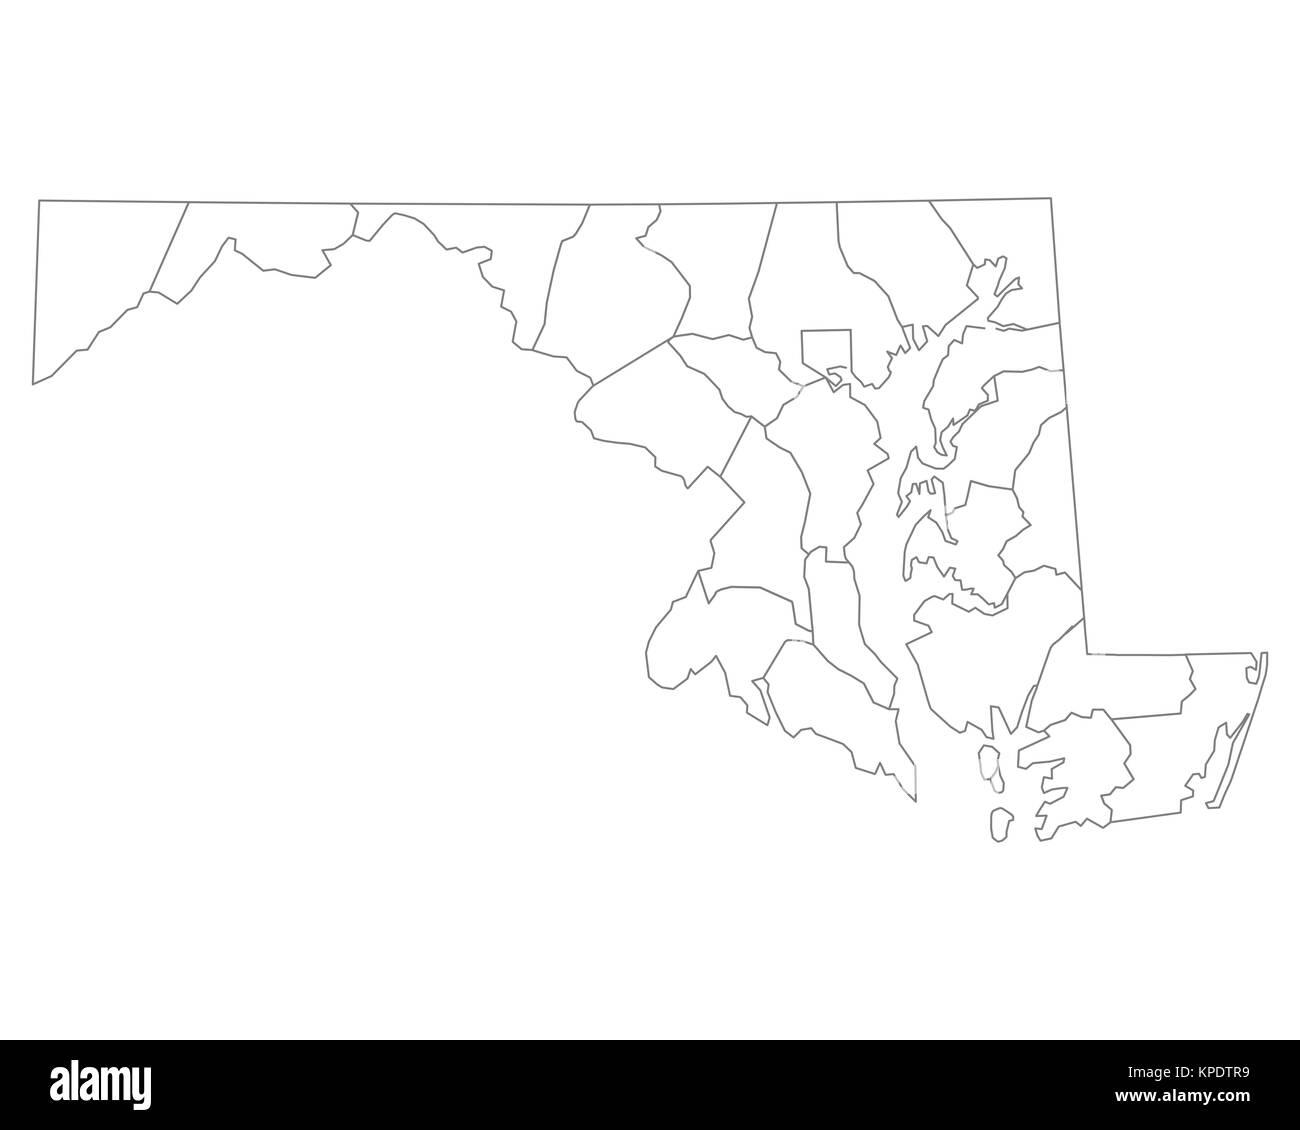 Map Maryland Usa Federal State Stock Photos & Map Maryland Usa ...